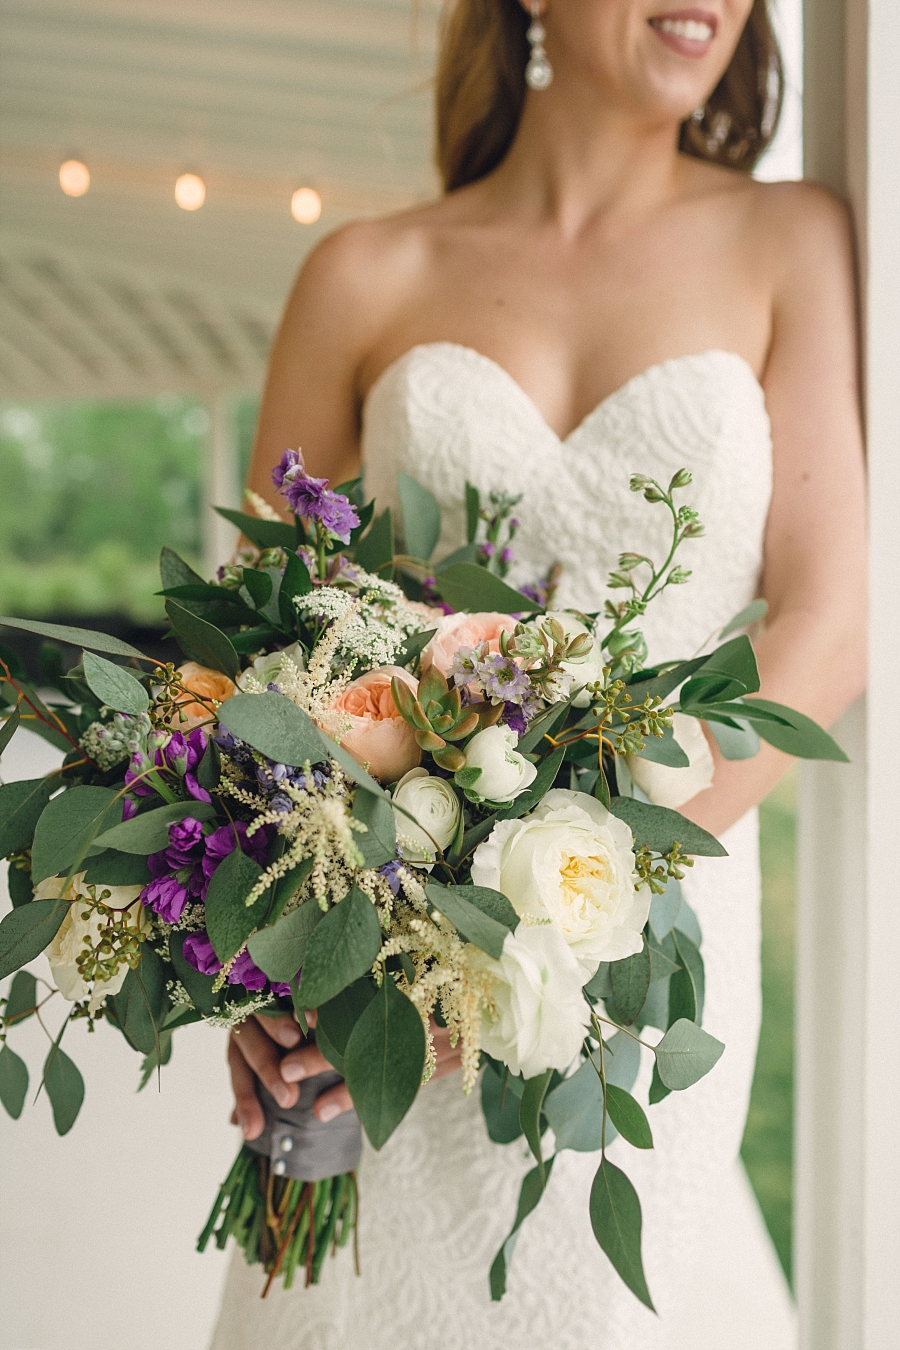 Stacy-Anderson-Photography-The-Farmhouse-Houston-Wedding-Photographer_0088.jpg